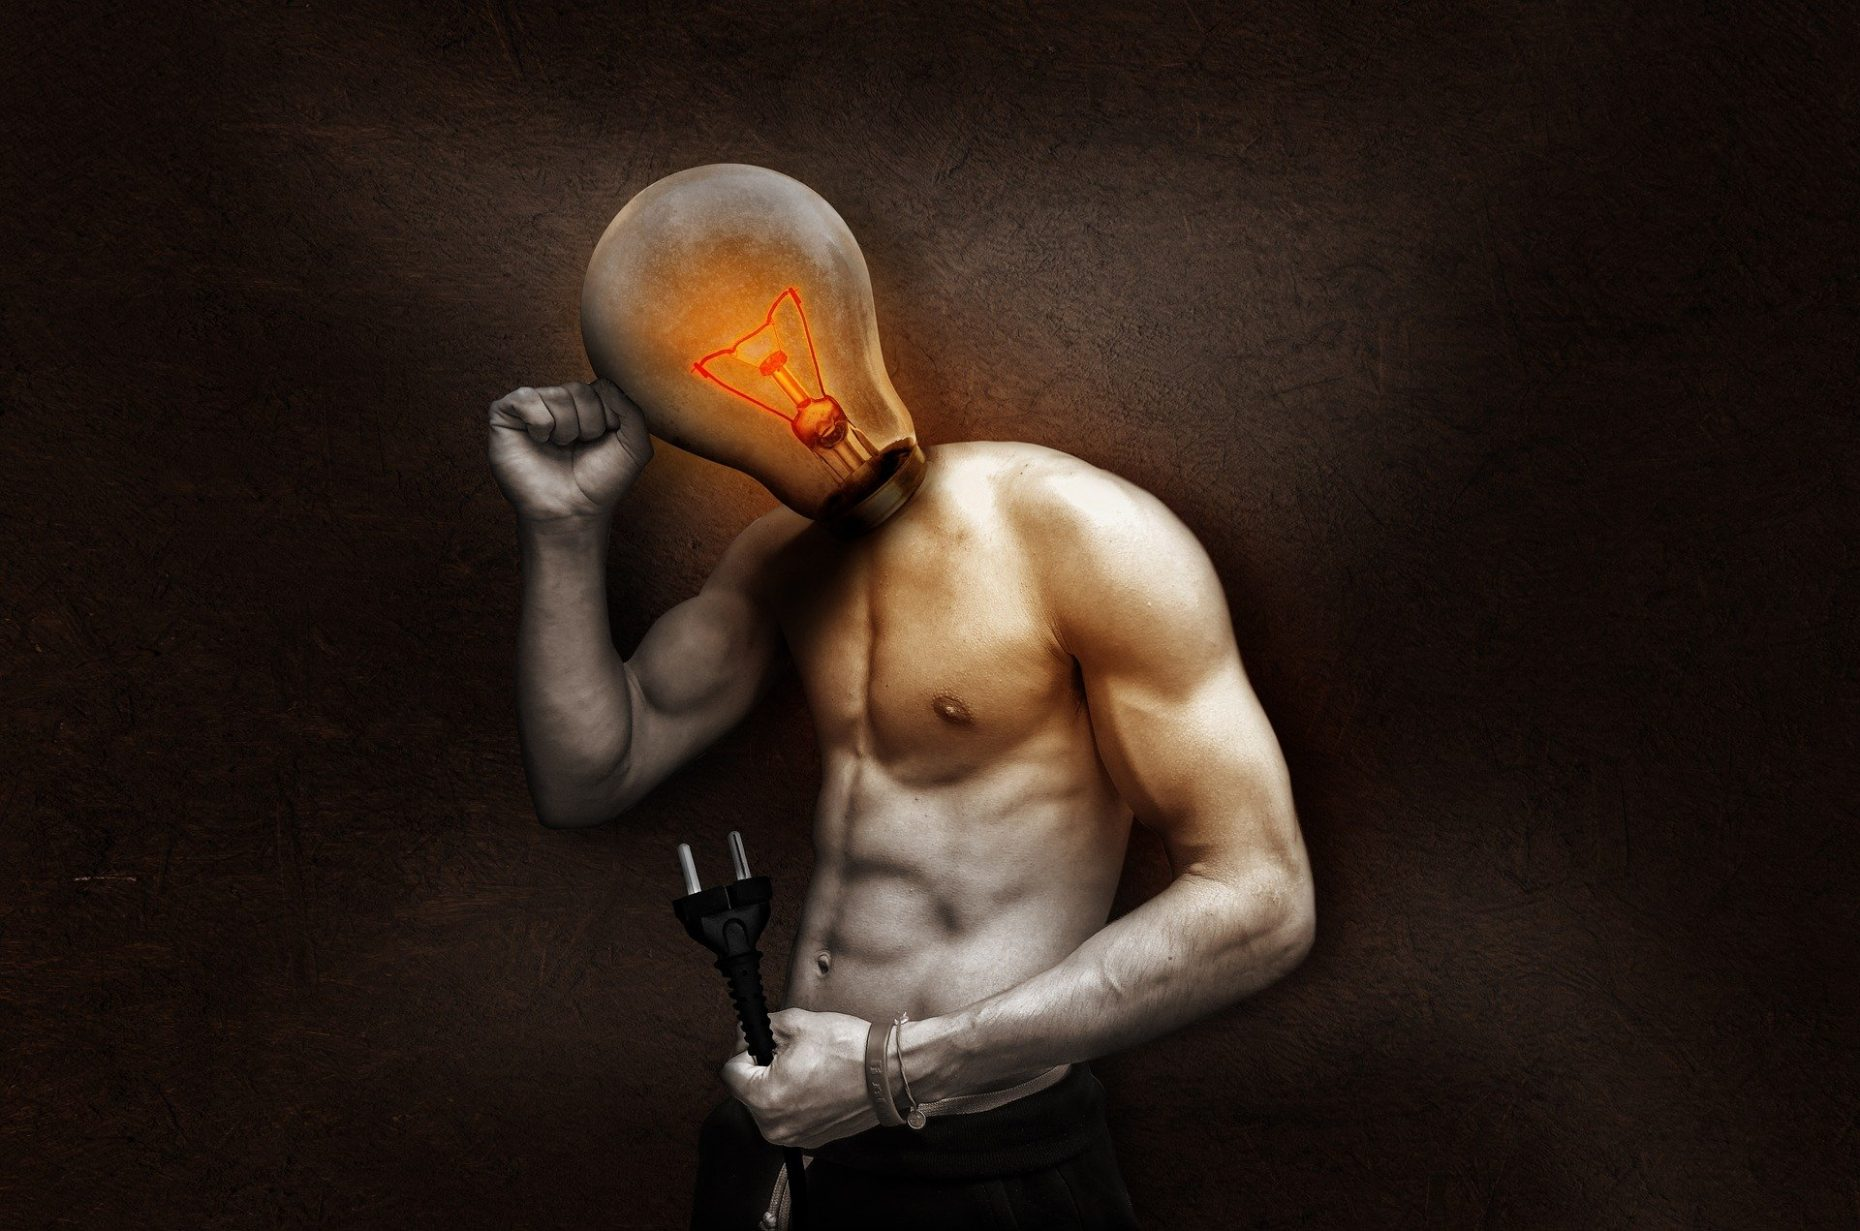 blood flow helps brain